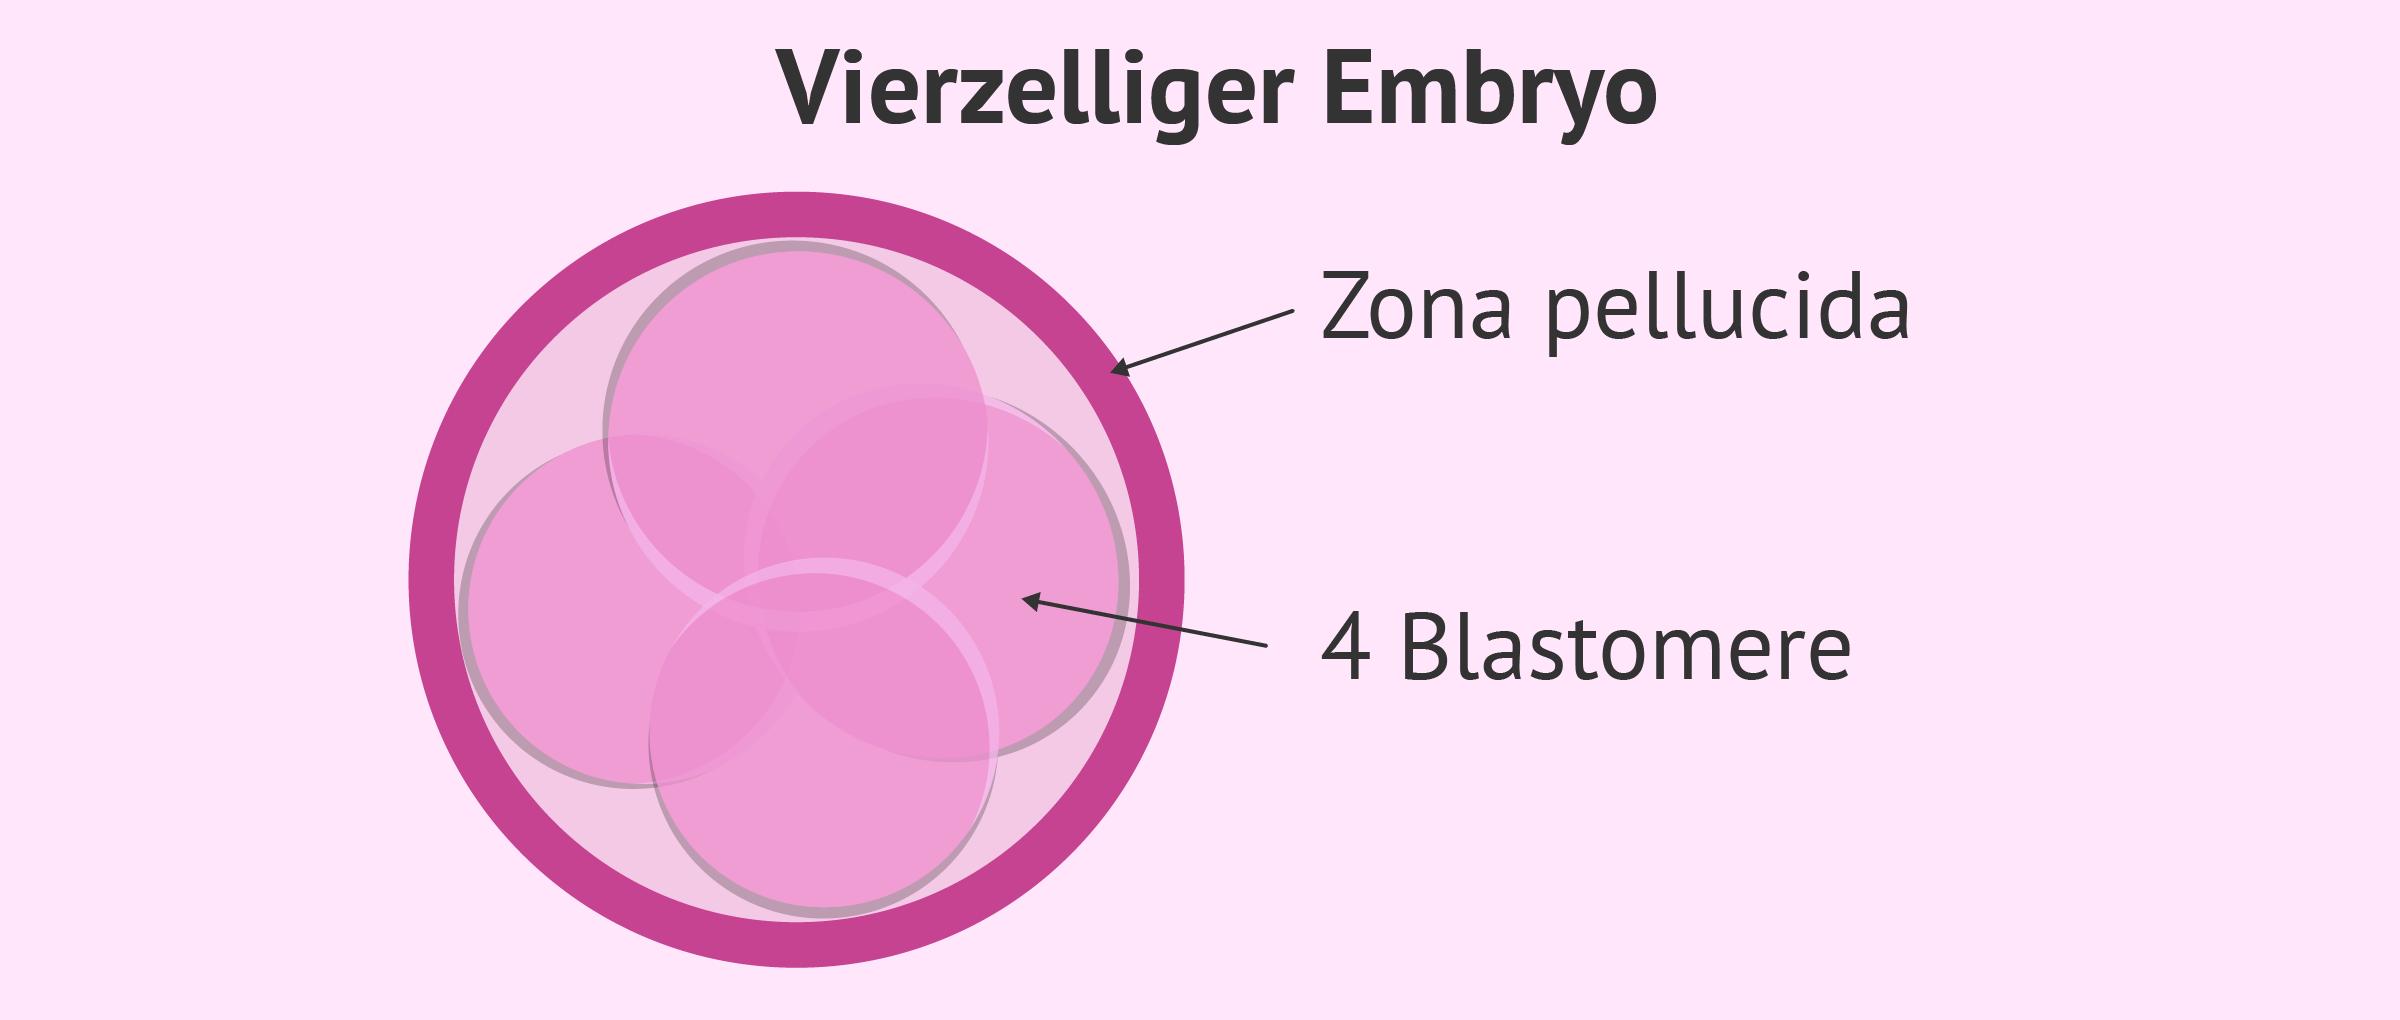 Embryostadium: Vierzelliger Embryo